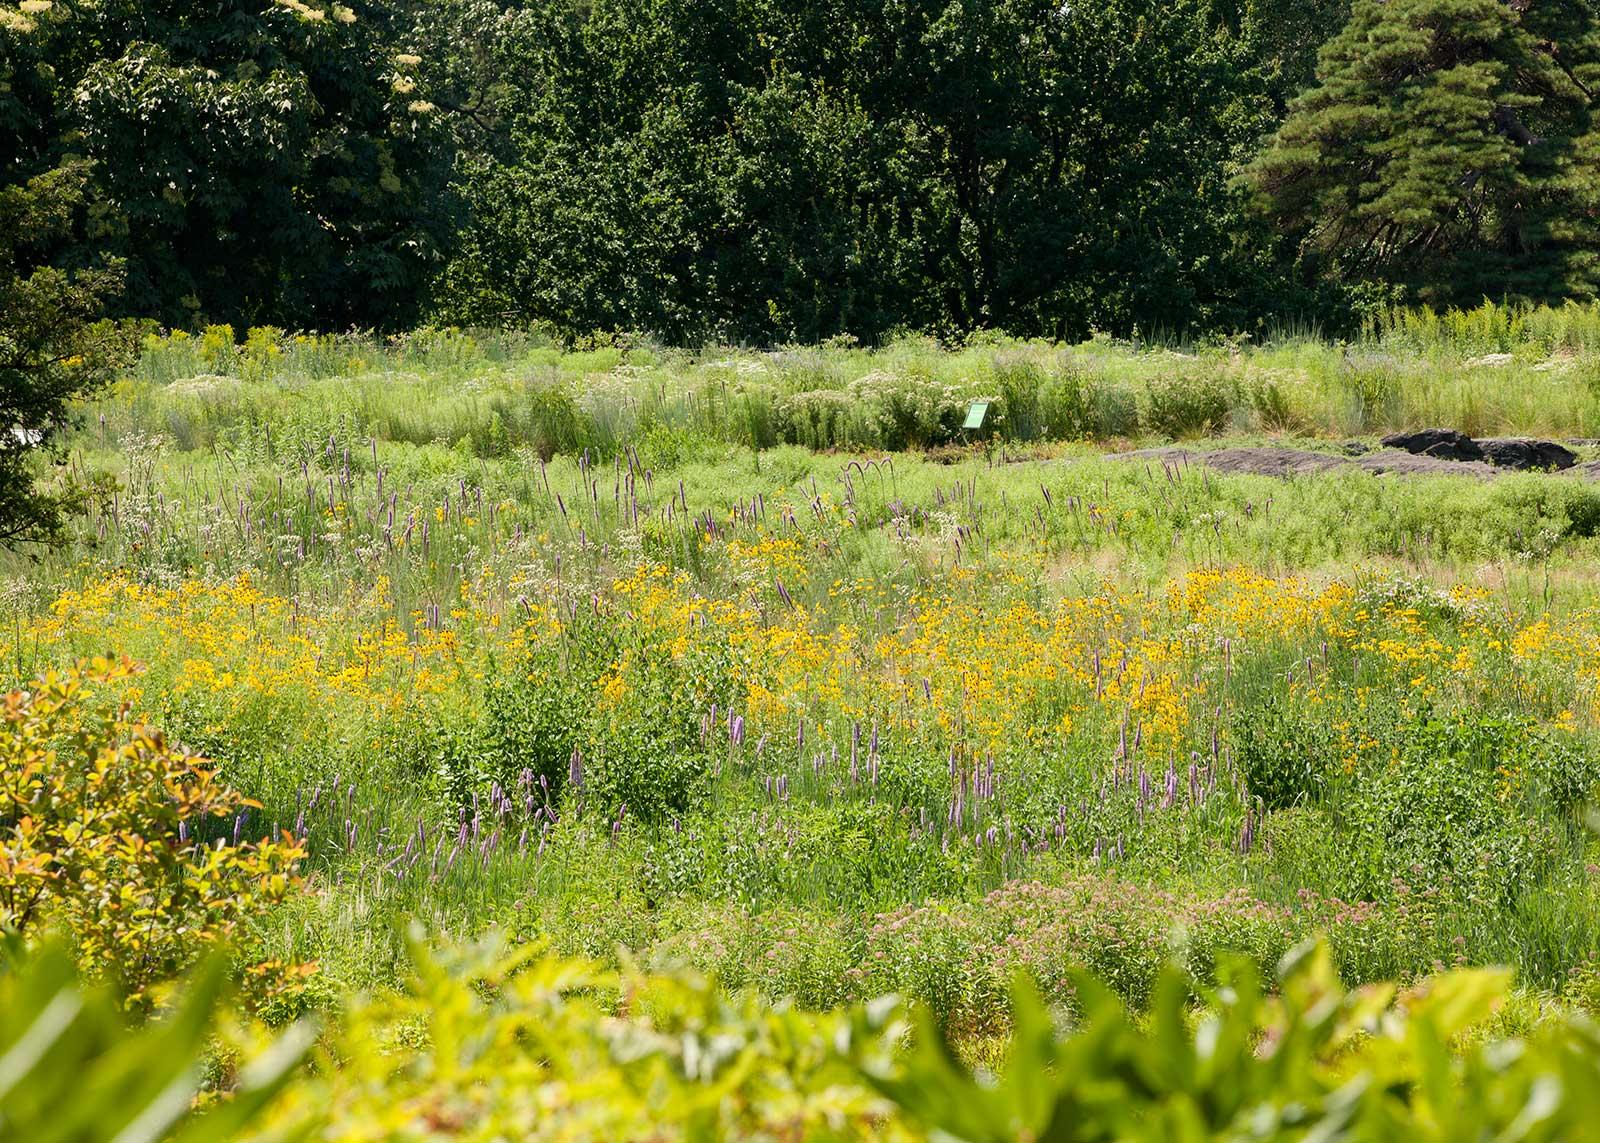 Native Plant Garden 3. The Native Plant Garden  NY   OvS   Landscape Architecture